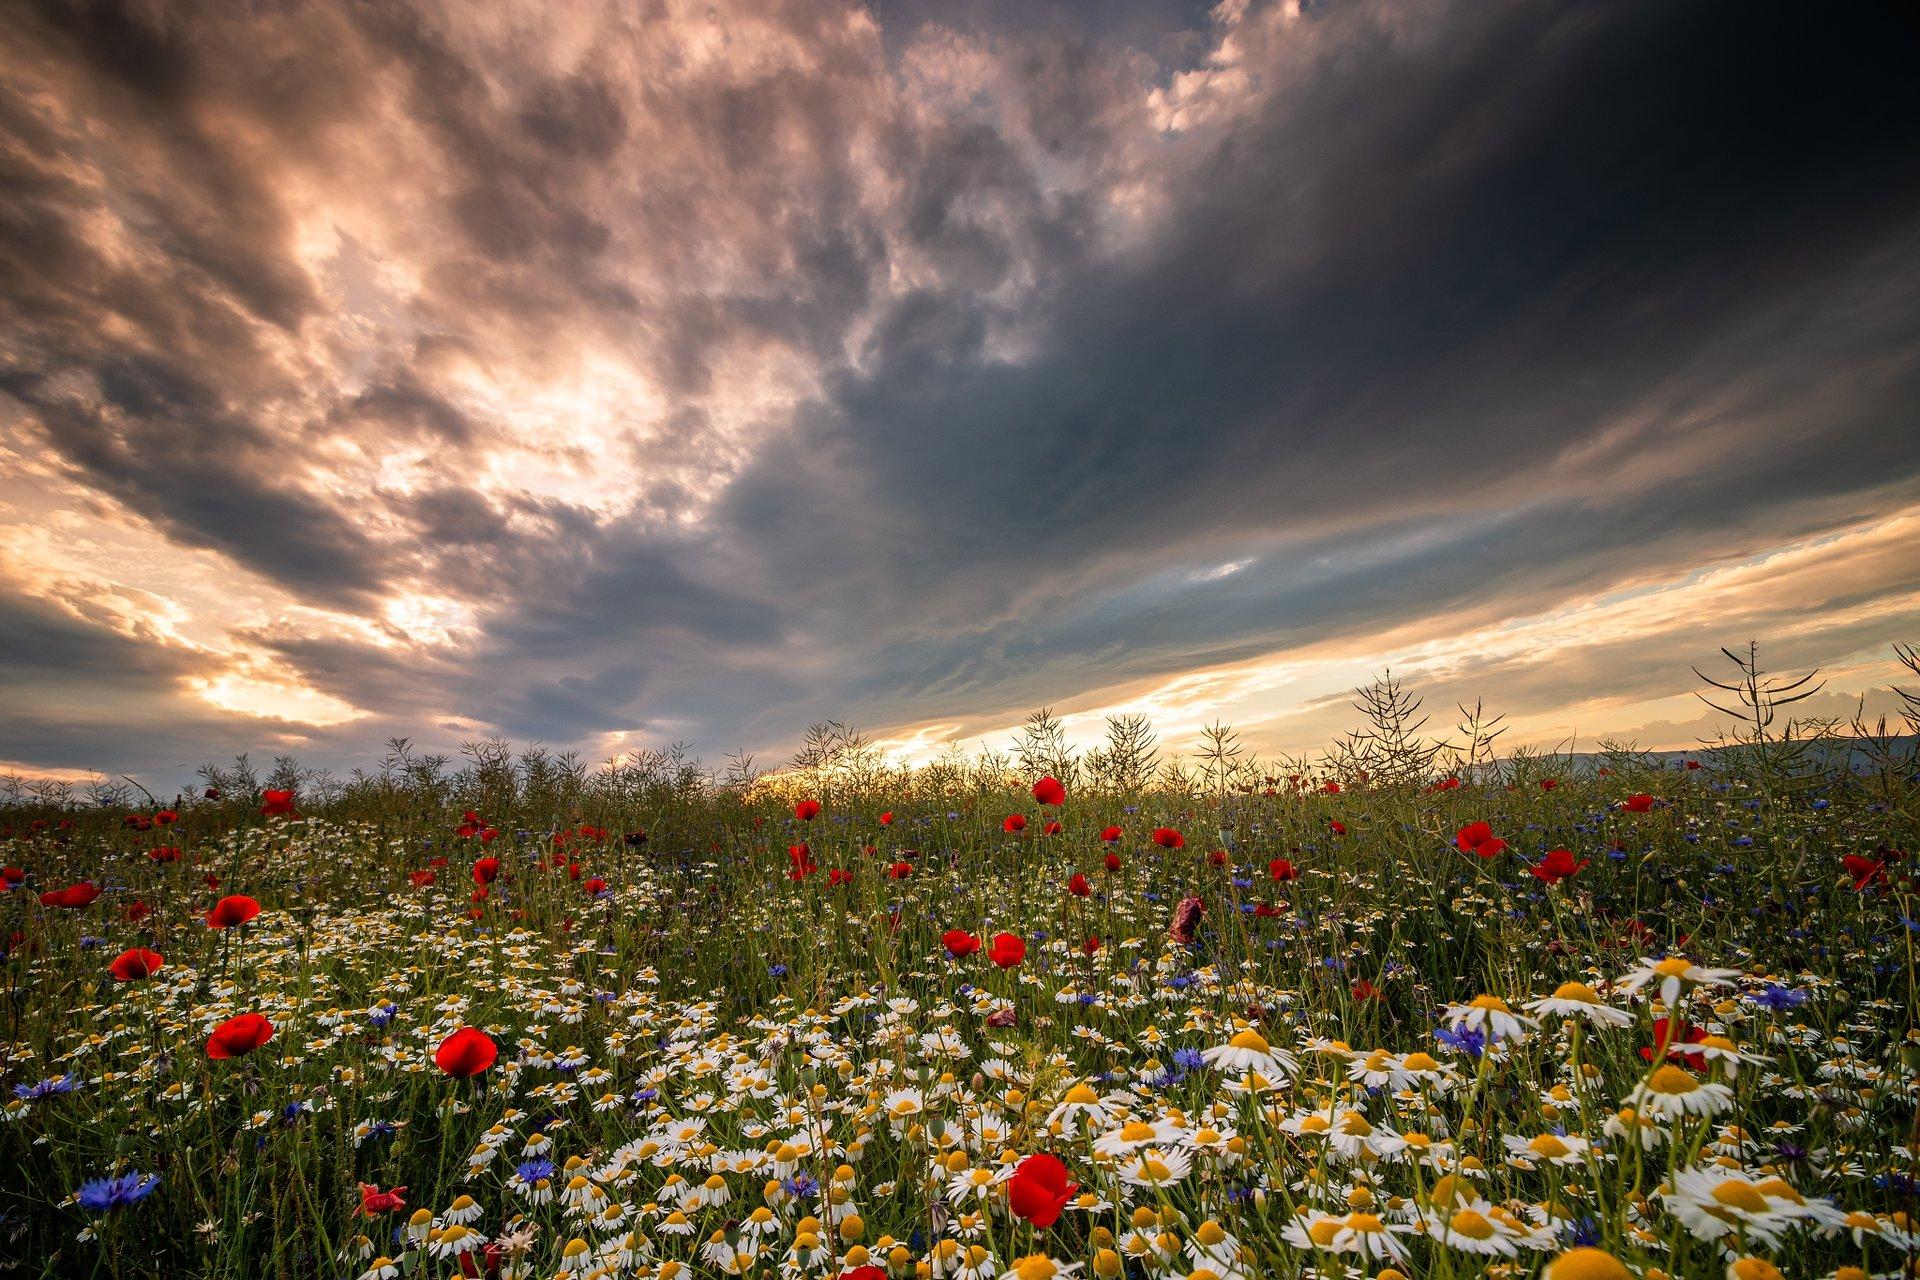 Photo in Landscape | Author Todor Todorov - skyblue | PHOTO FORUM